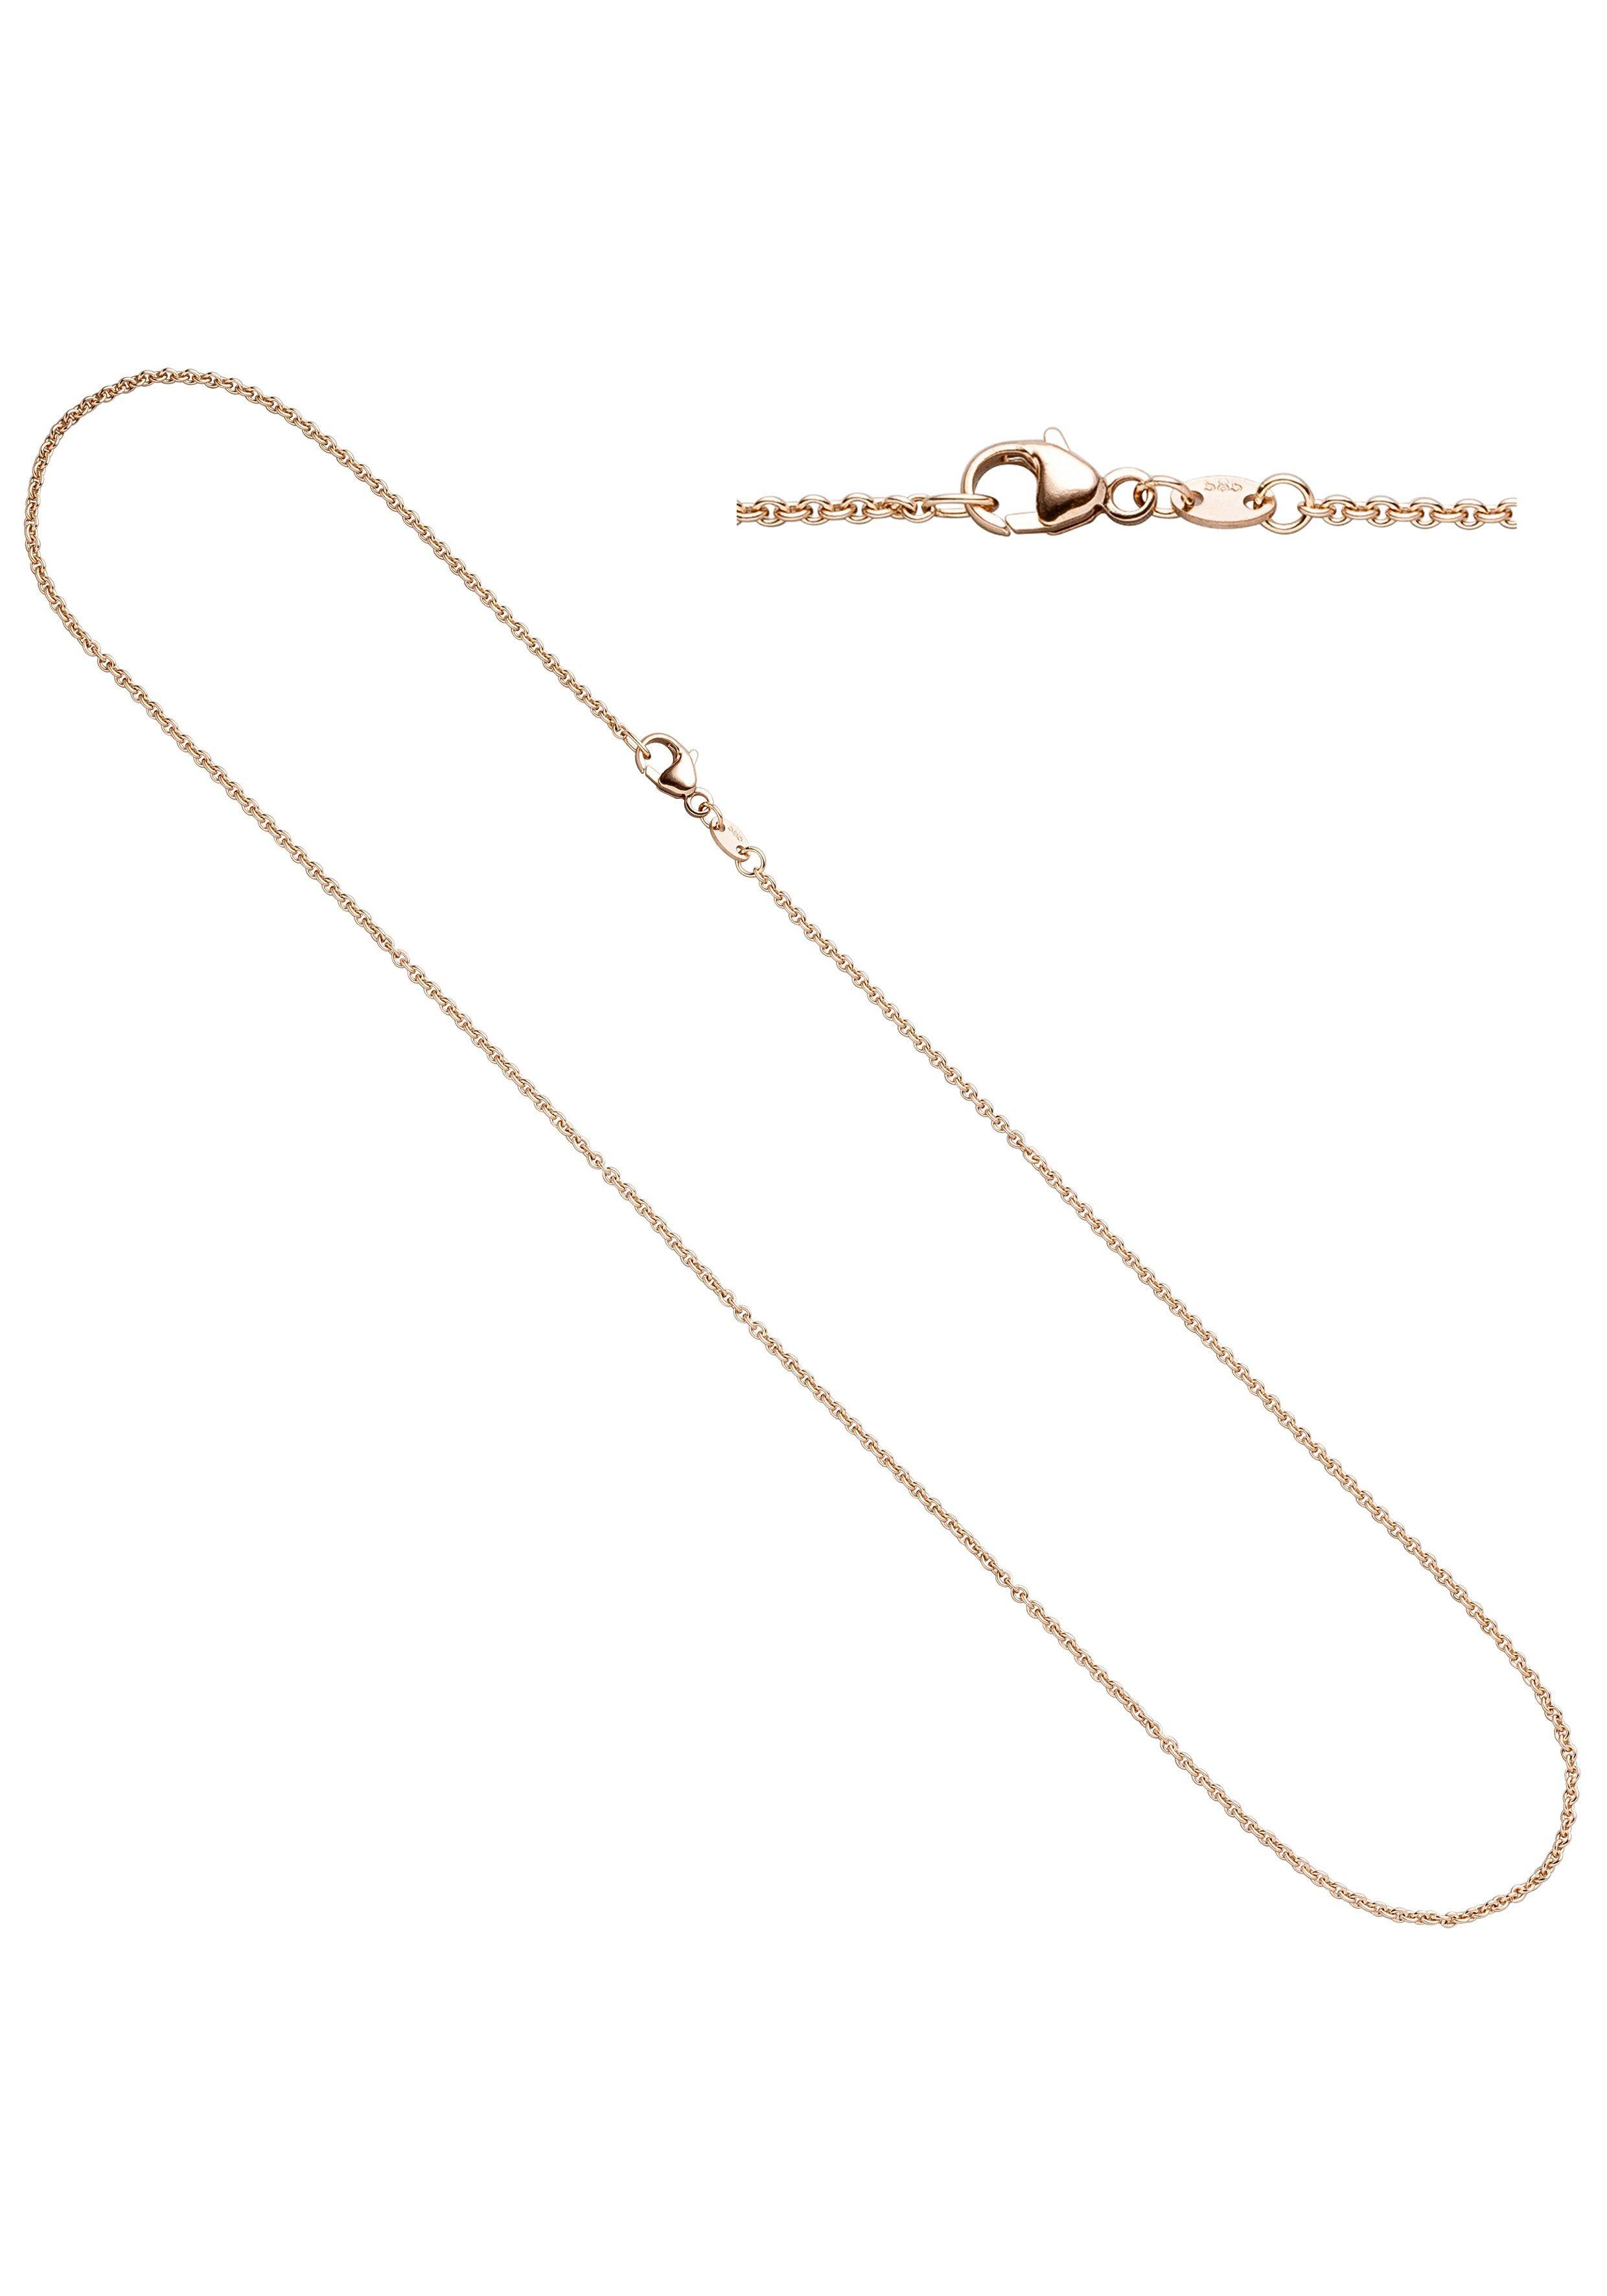 JOBO Goldkette Ankerkette 585 Roségold 42 cm 1,5 mm   Schmuck > Halsketten > Goldketten   JOBO